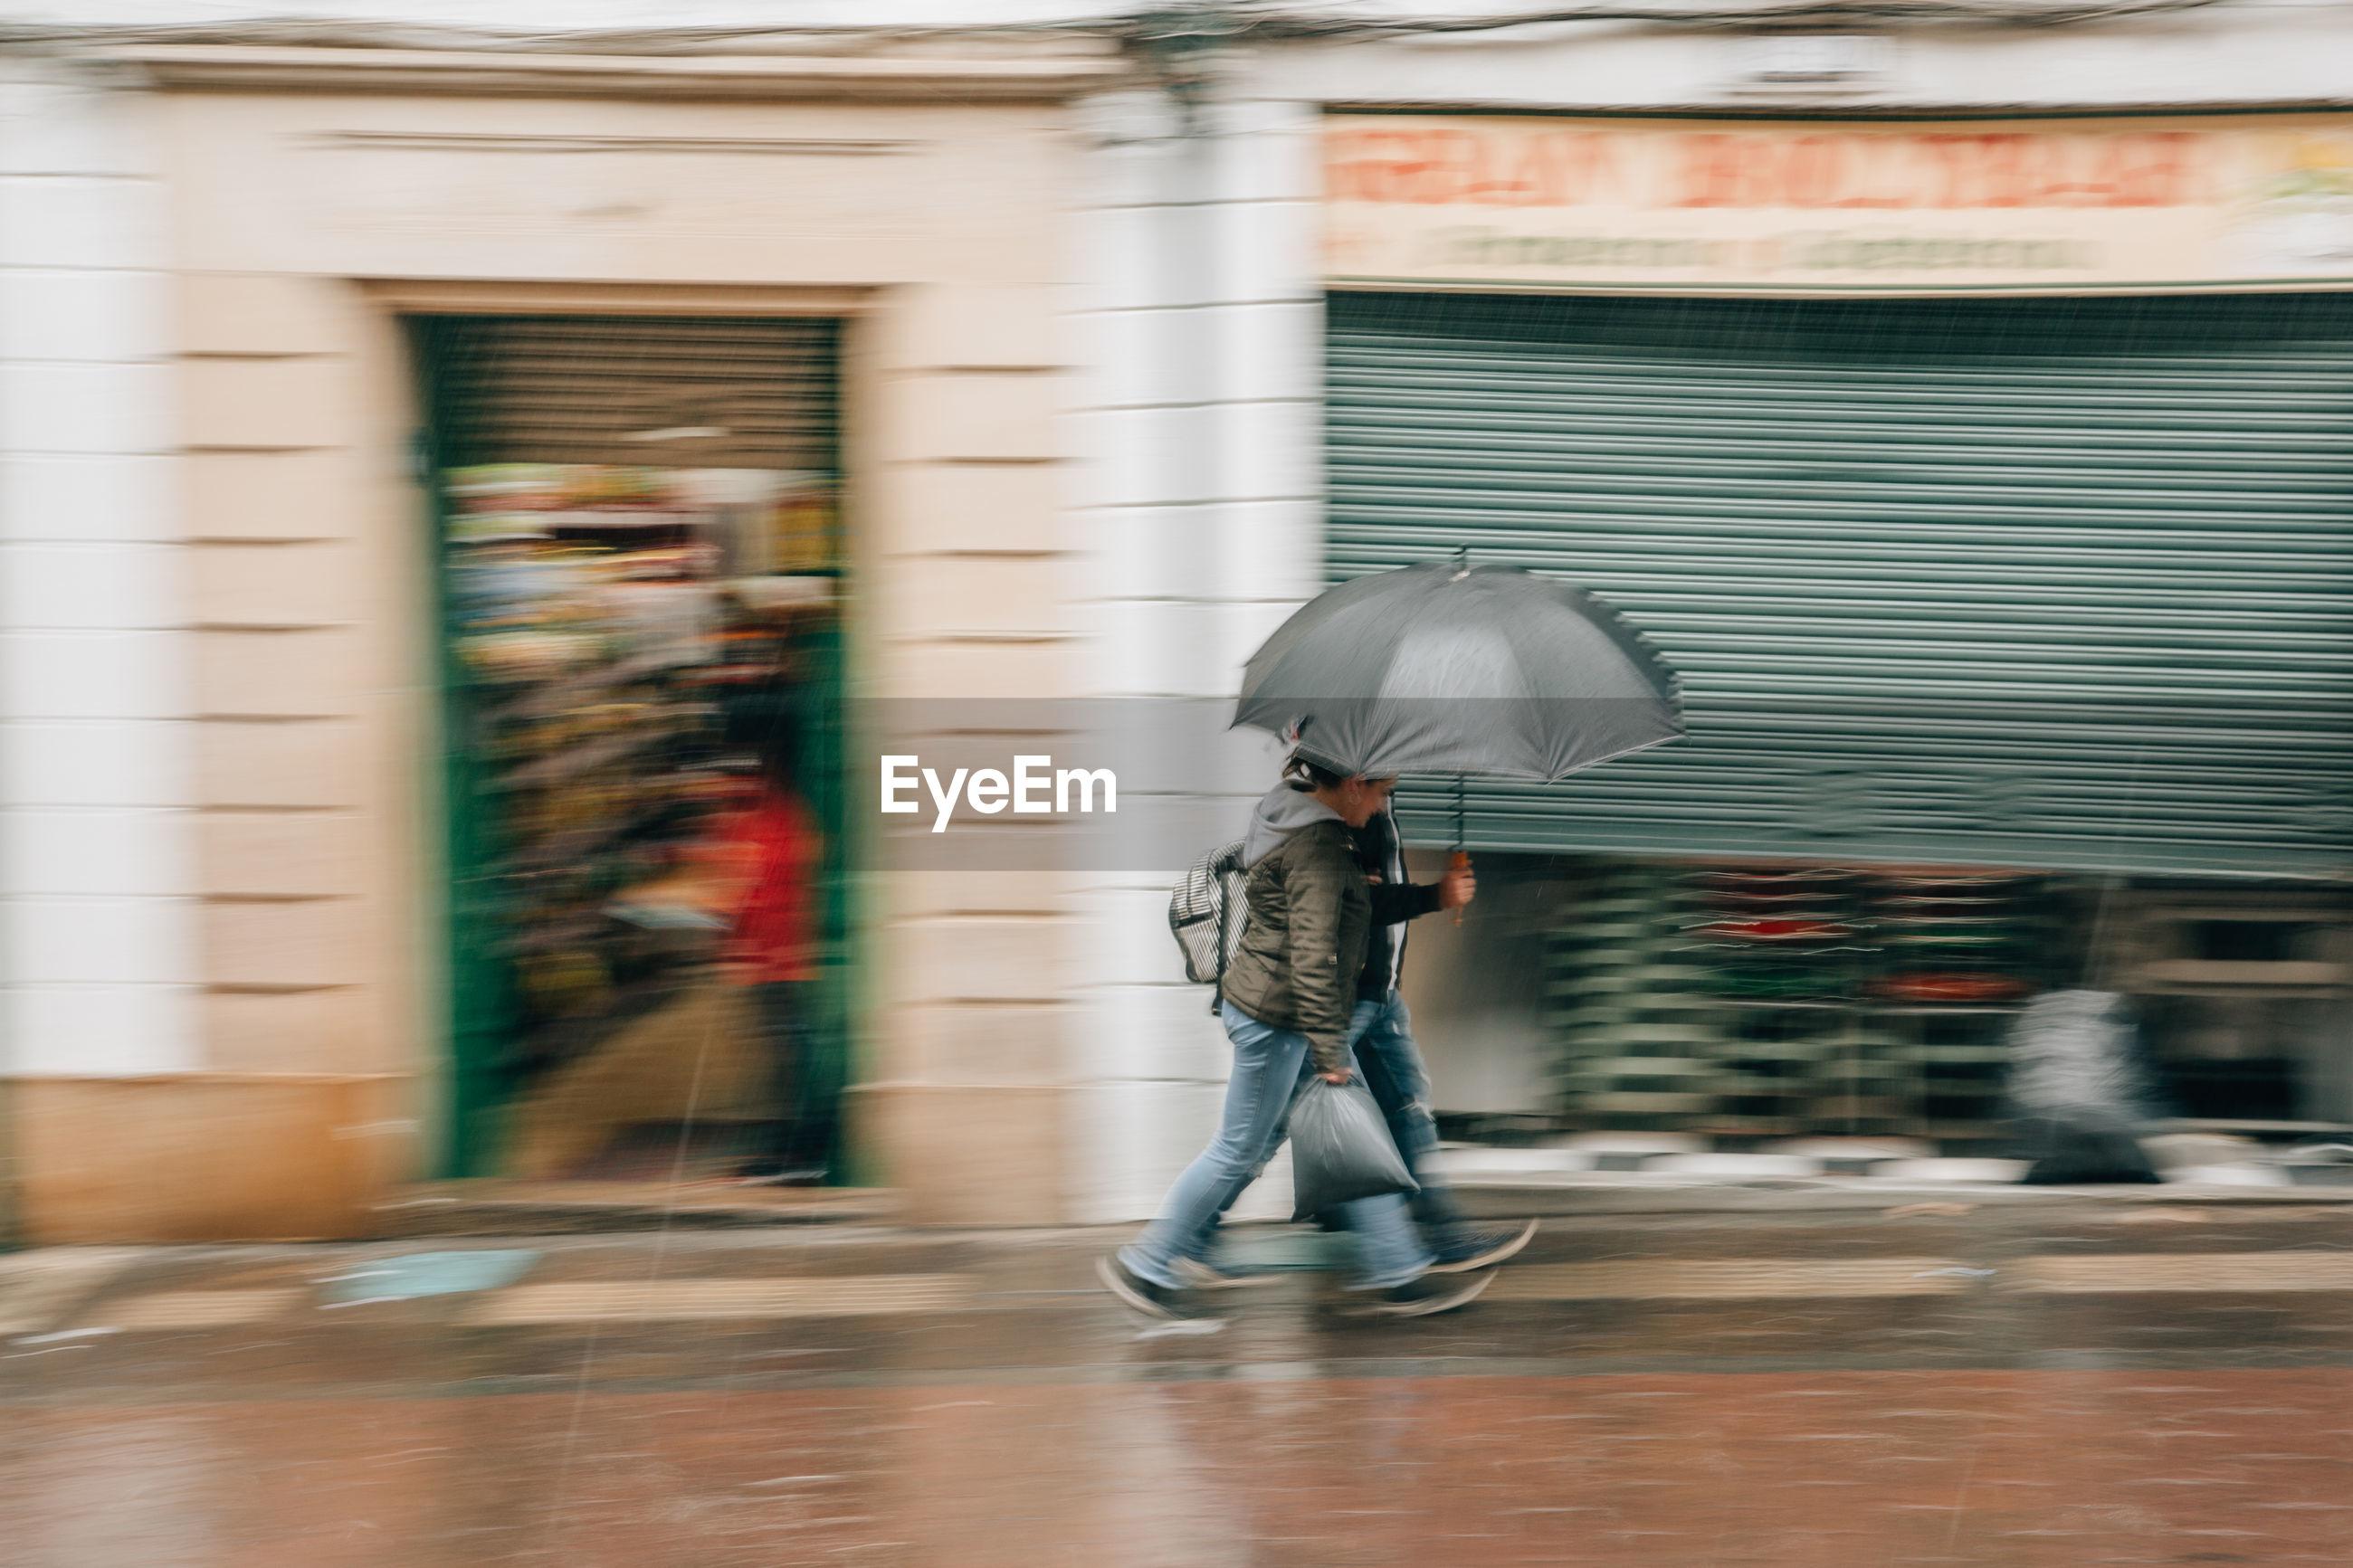 FULL LENGTH OF A WOMAN WALKING ON STREET